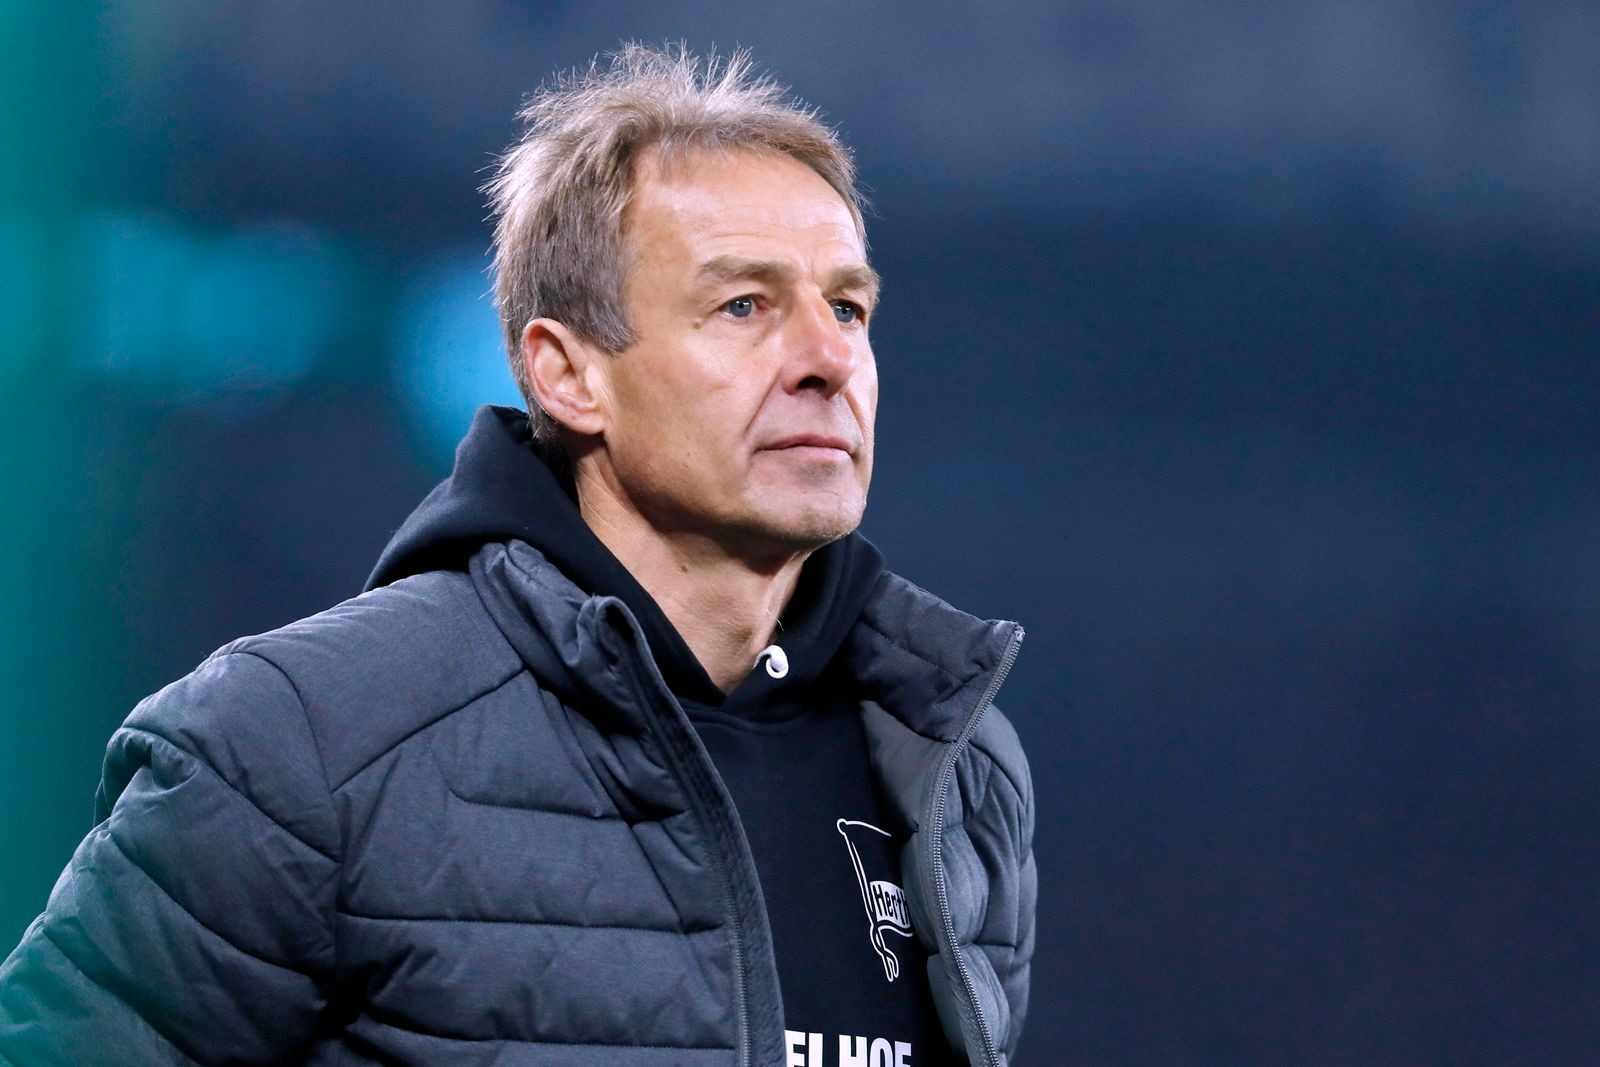 KLINSMANN Juergen Trainer Team Hertha BSC Berlin DFB Pokal Achtelfinale 2019 - 2020 Spiel FC Schalke 04 - Hertha BSC Ber